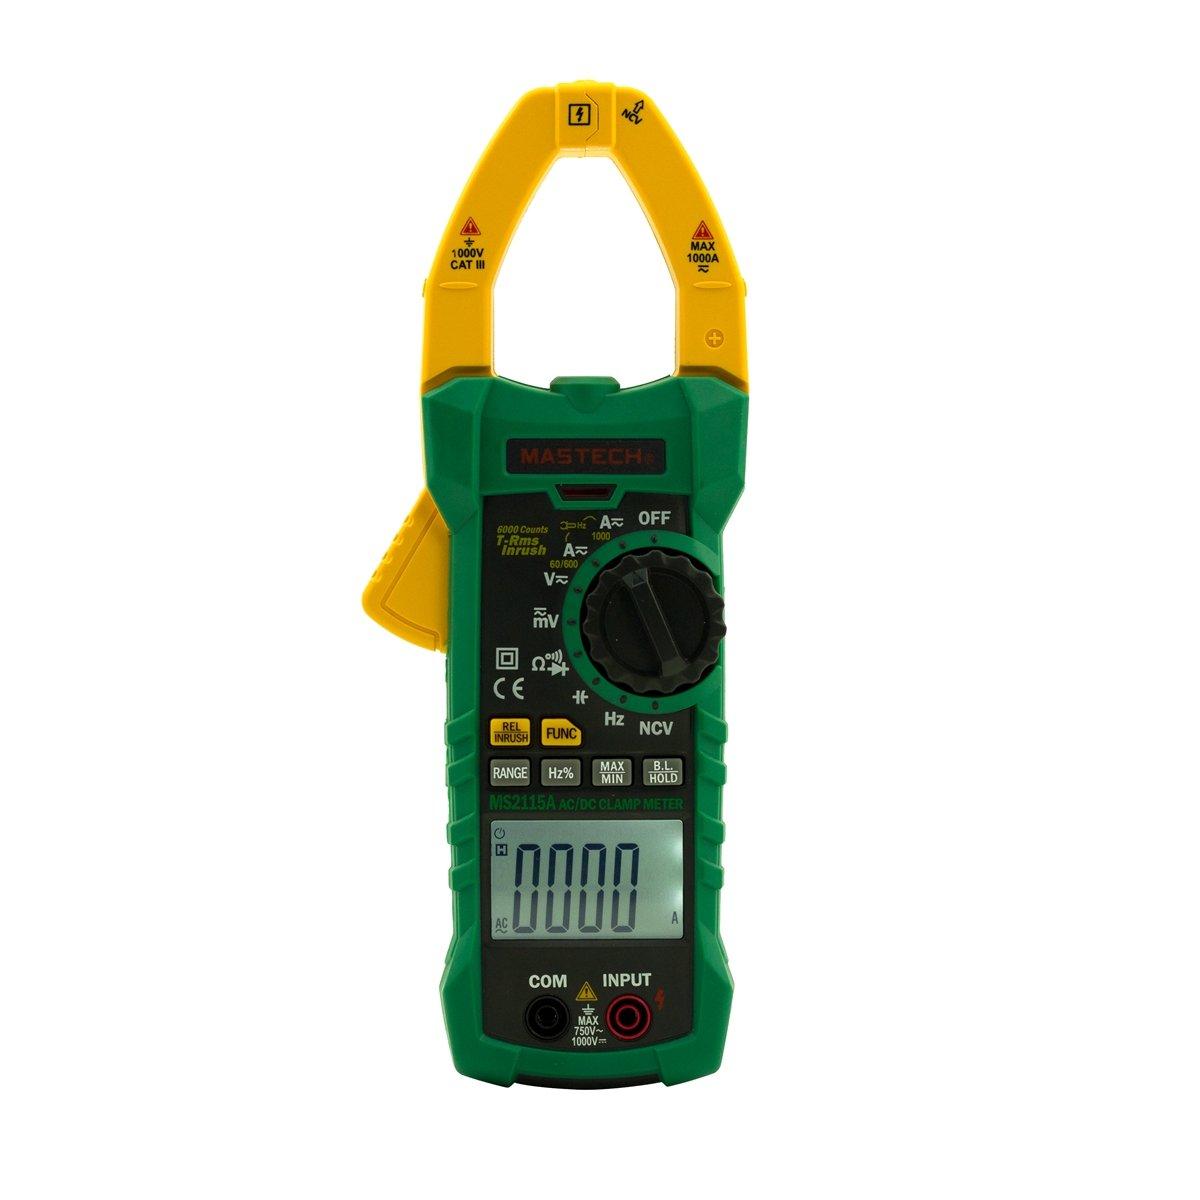 Mastech MS2115A True RMS DIGITAL DC/AC CLAMP METERS Multimeter Amp Voltage R HZ